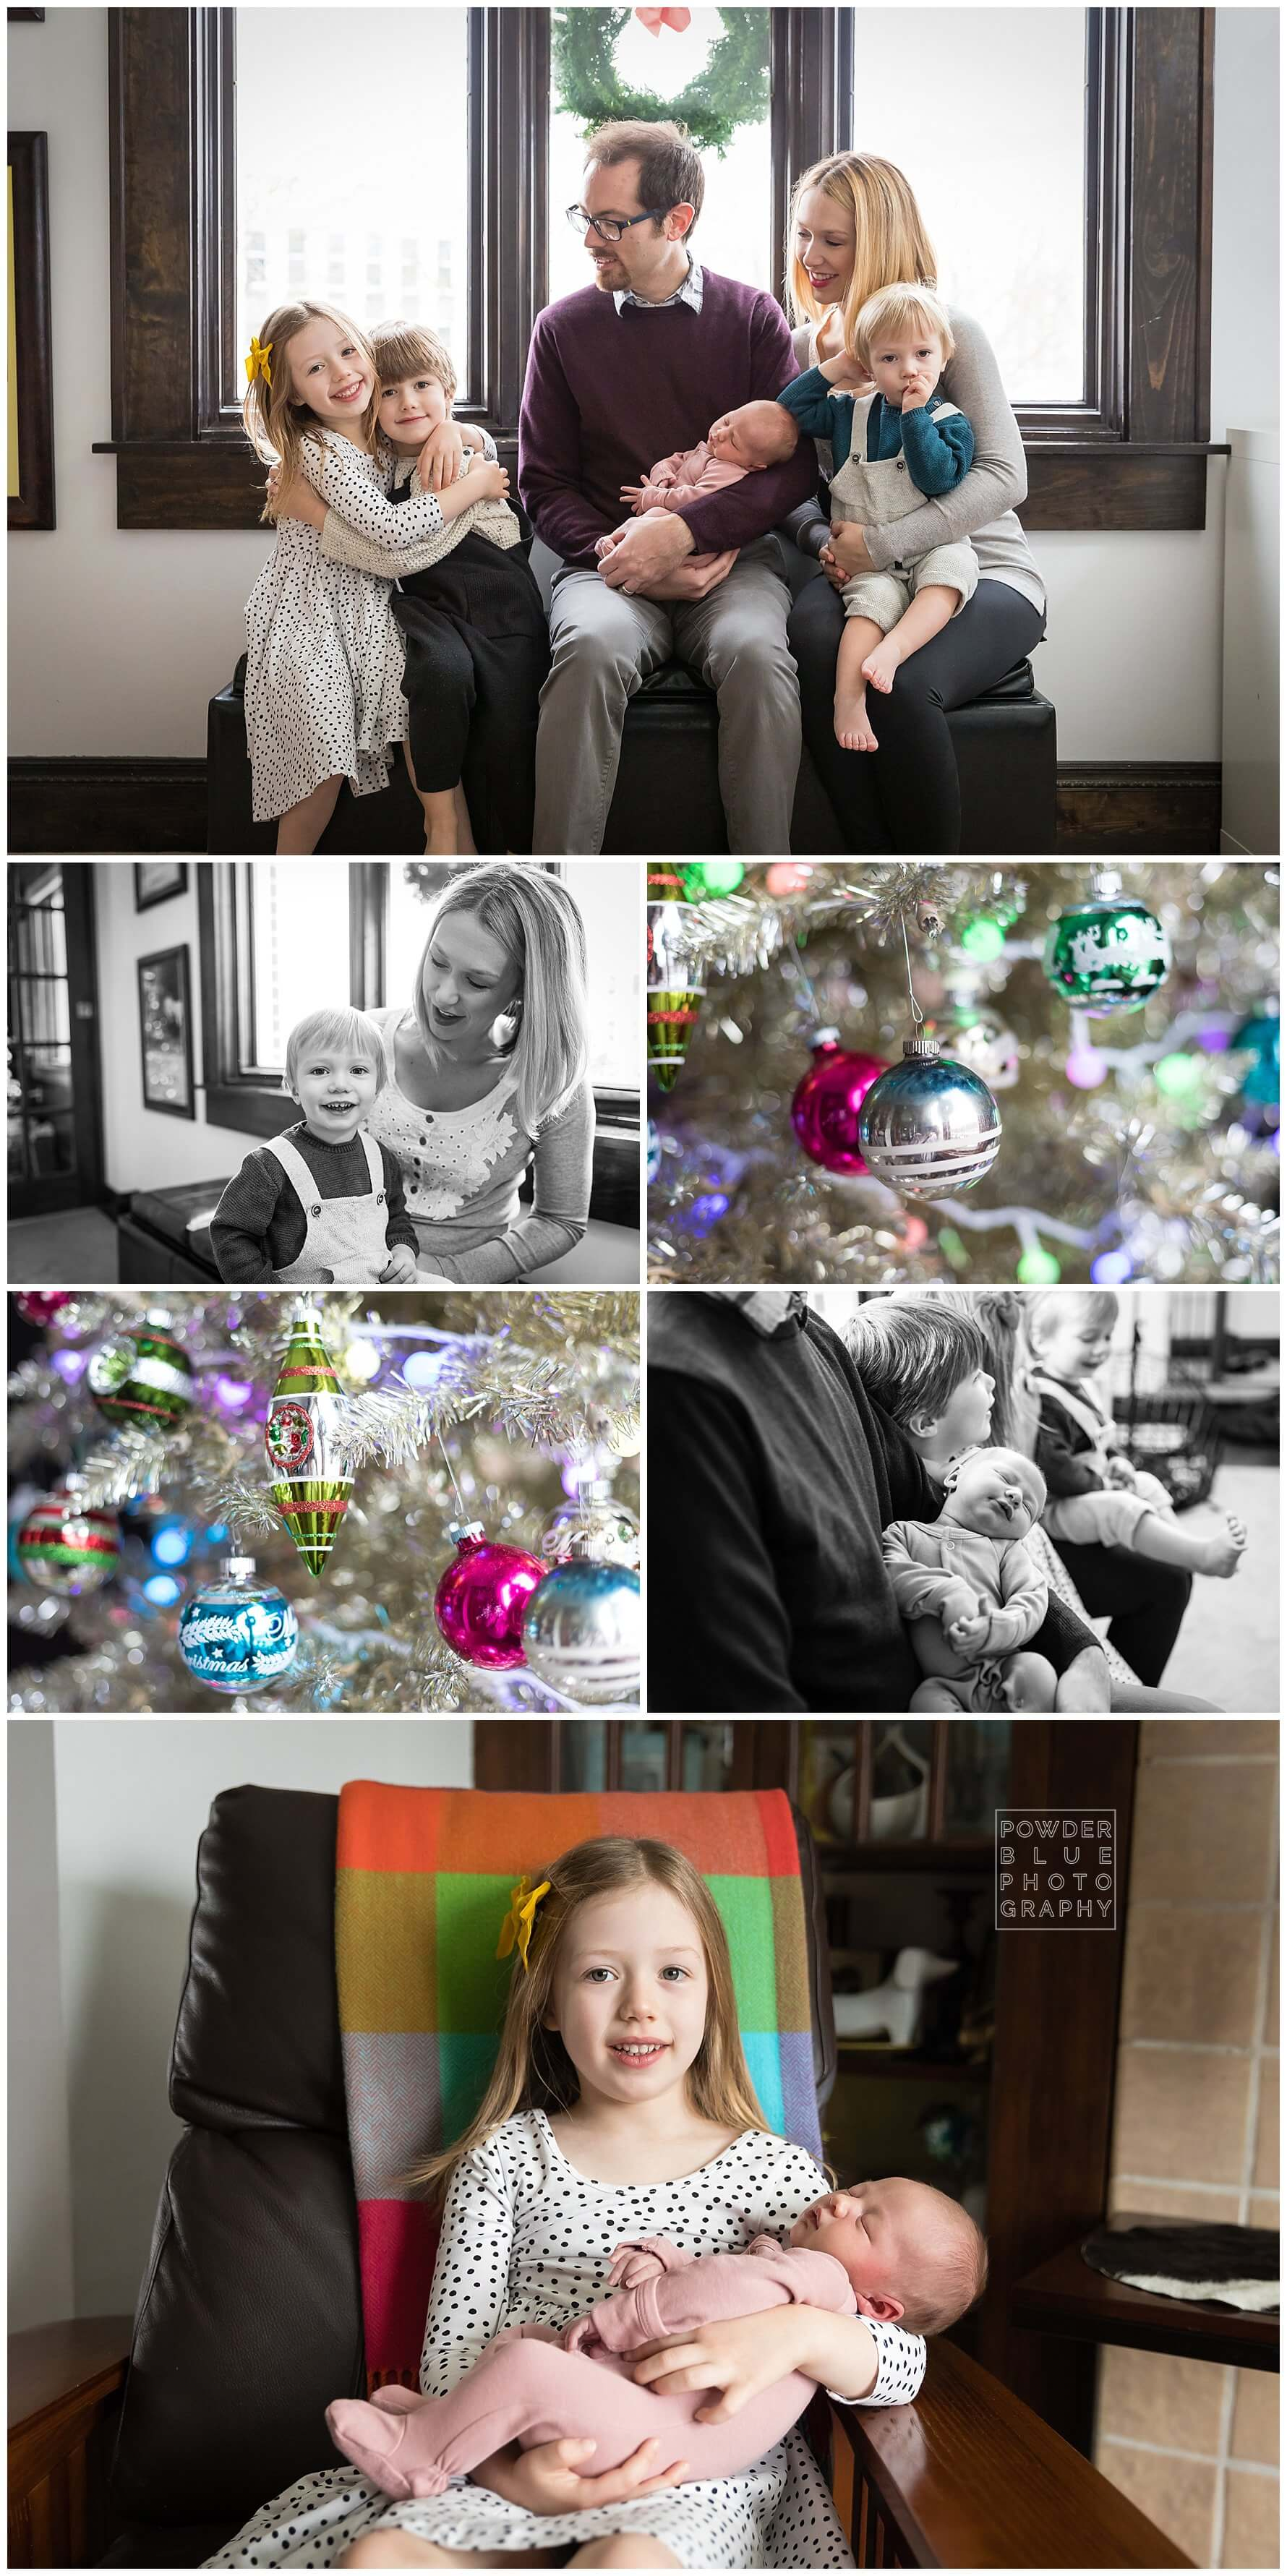 pittsburgh lifestyle newborn photographer. newborn family portrait on a bed.